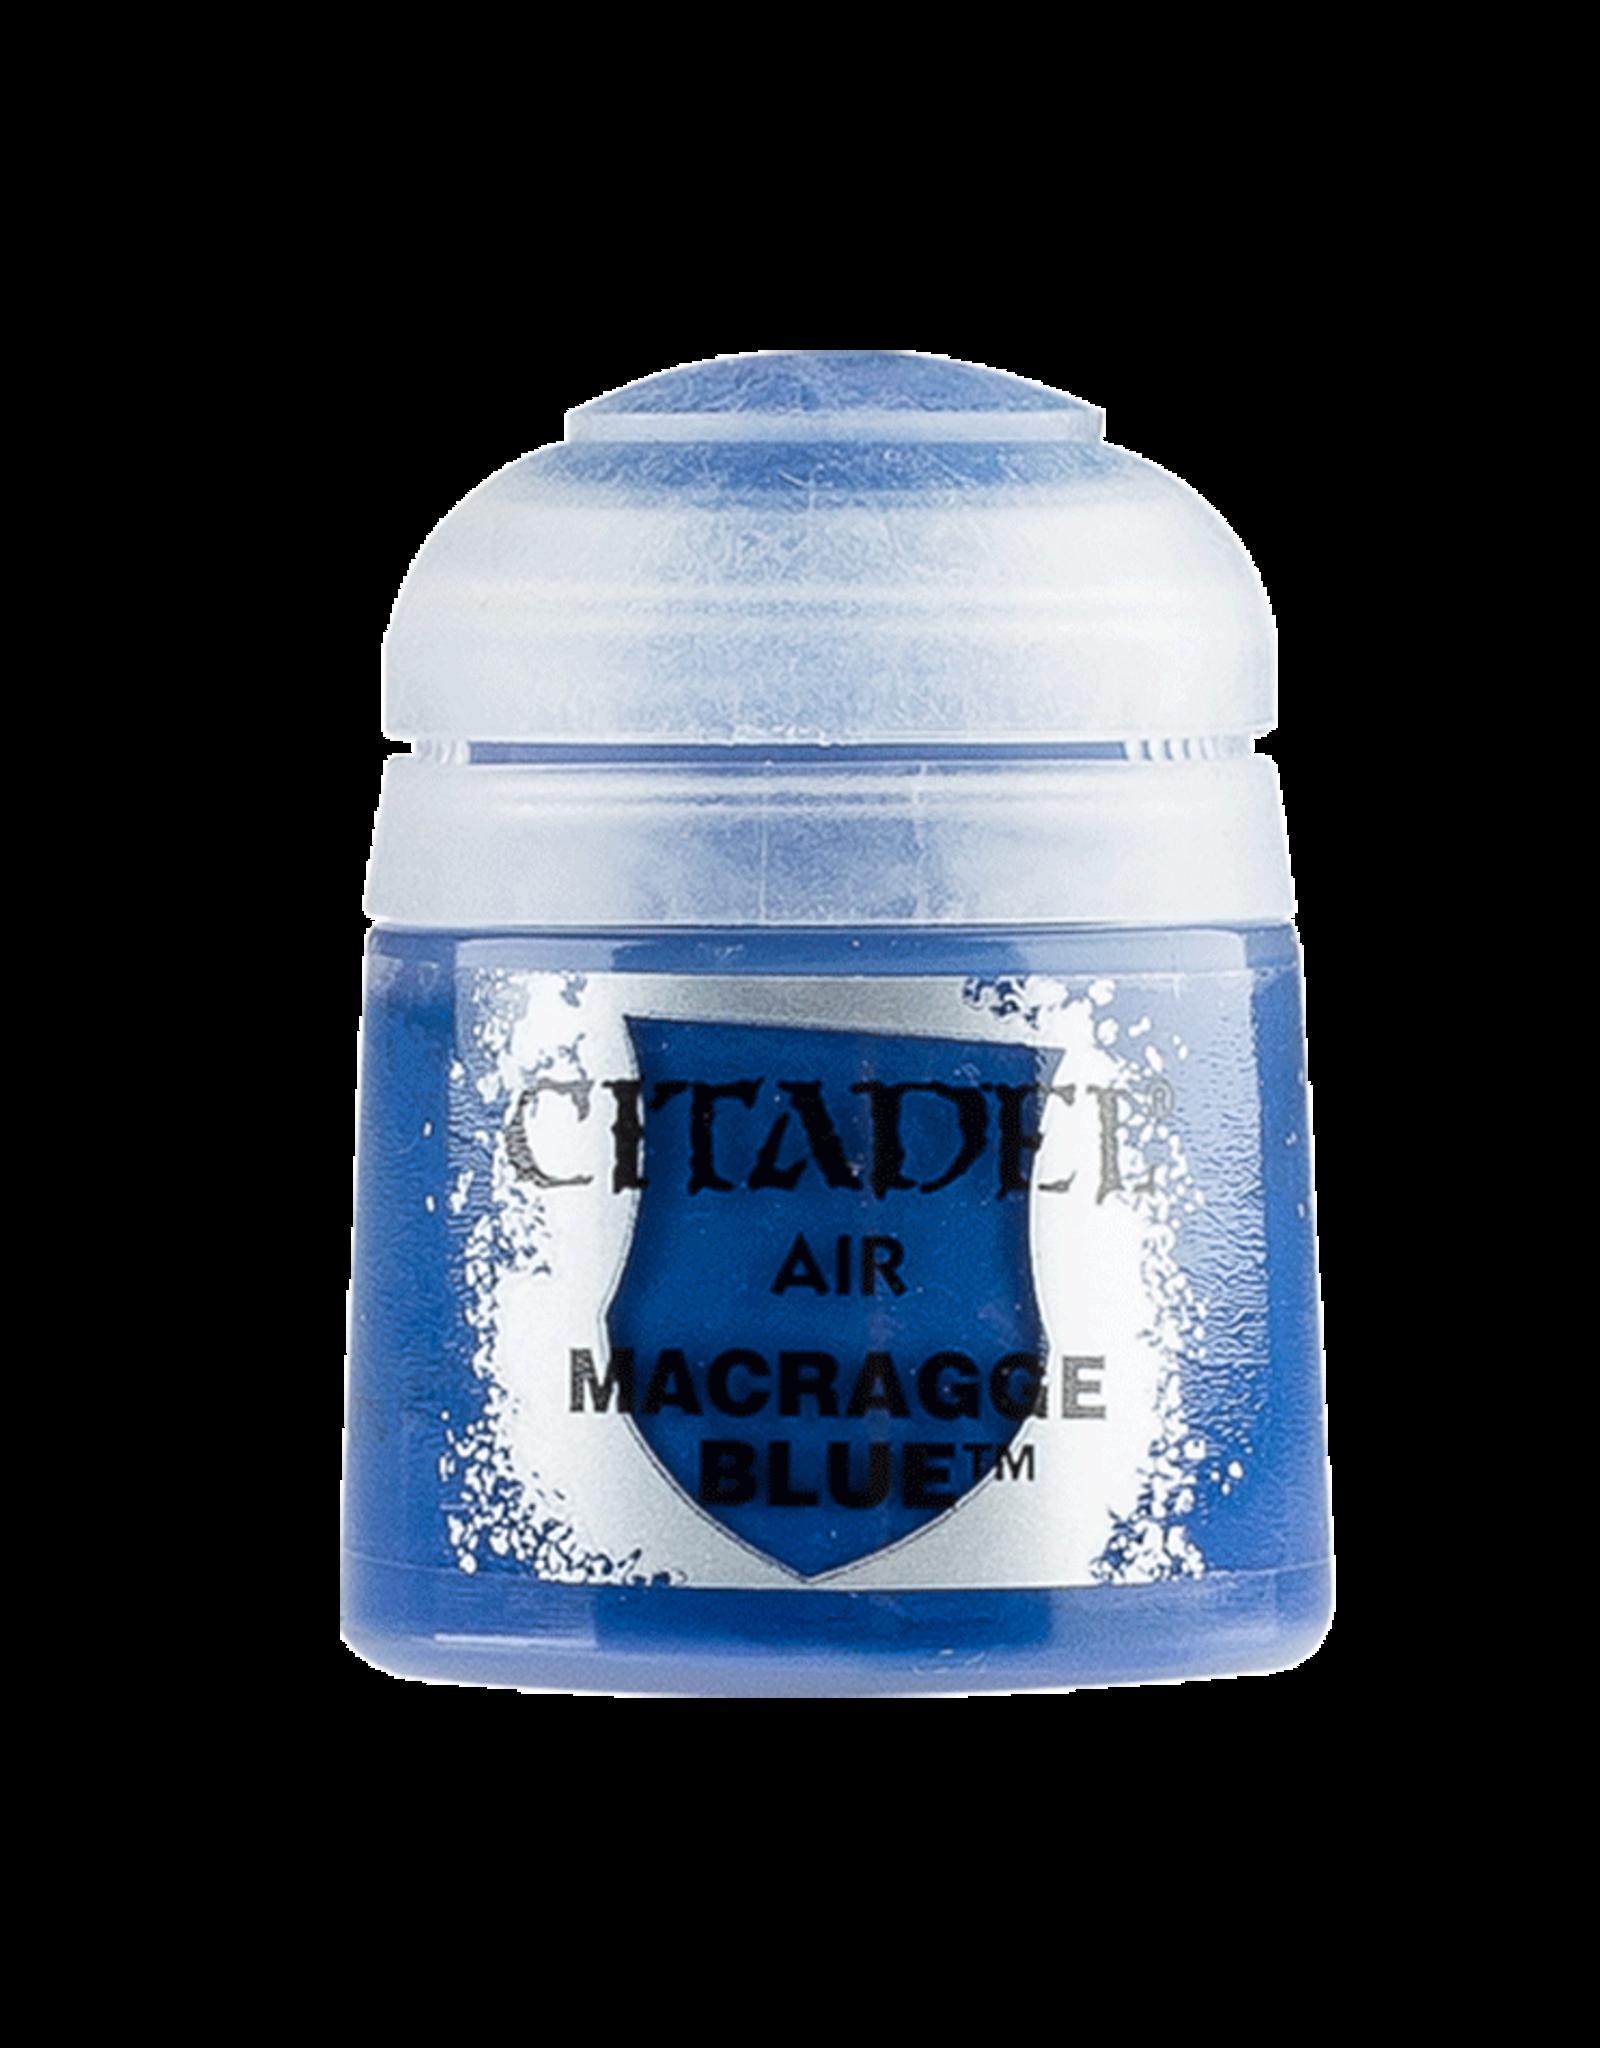 Games Workshop Citadel Air: Macragge Blue (24ml)